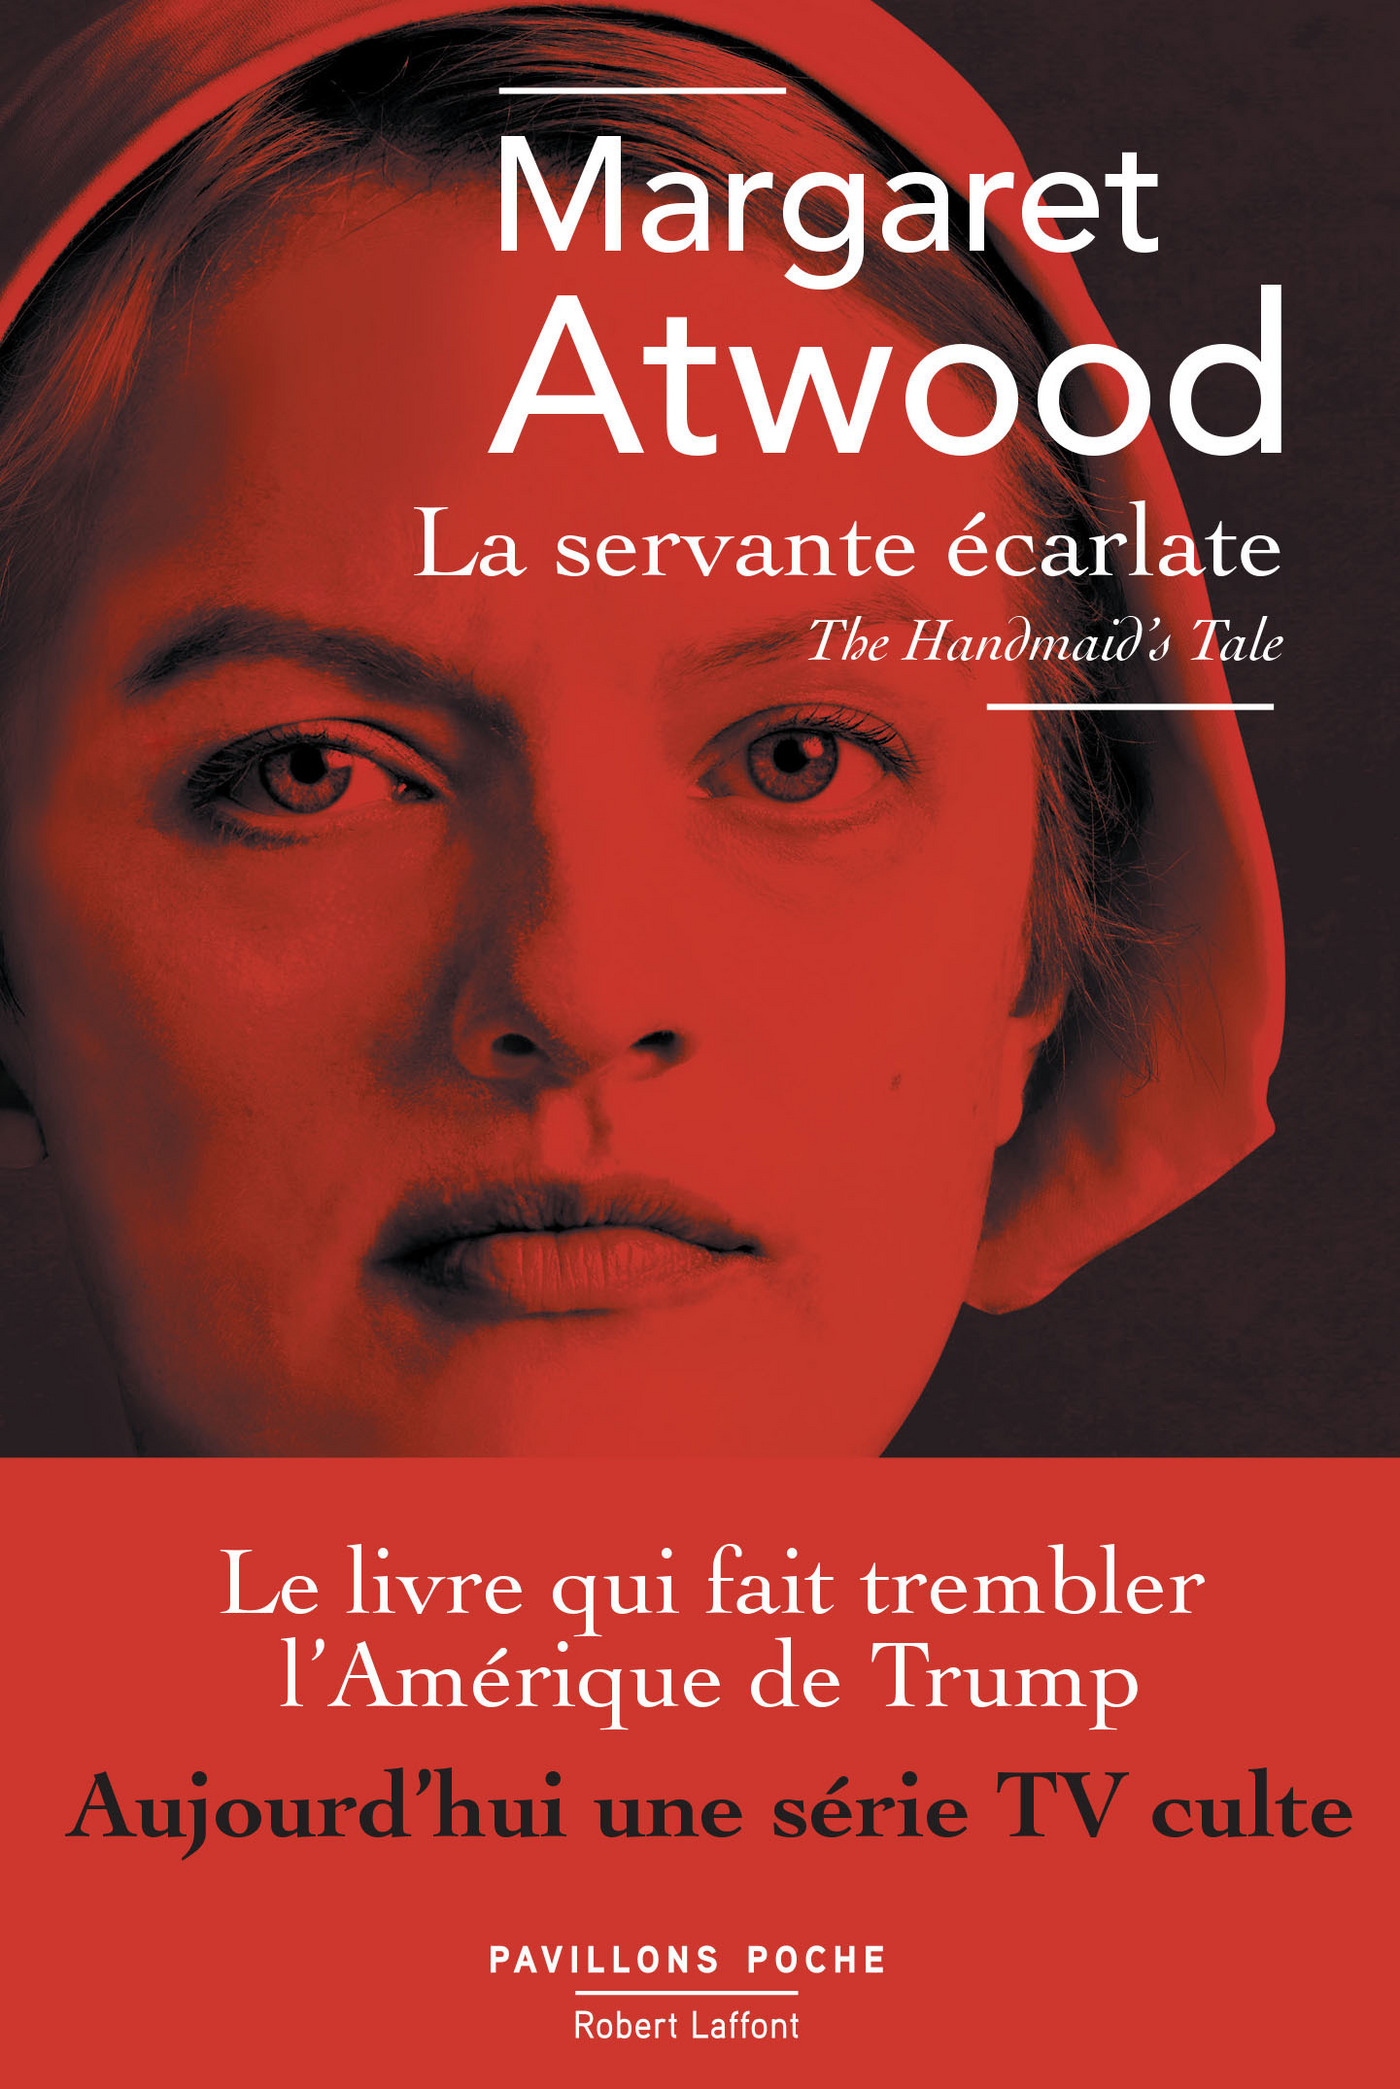 La Servante écarlate | ATWOOD, Margaret